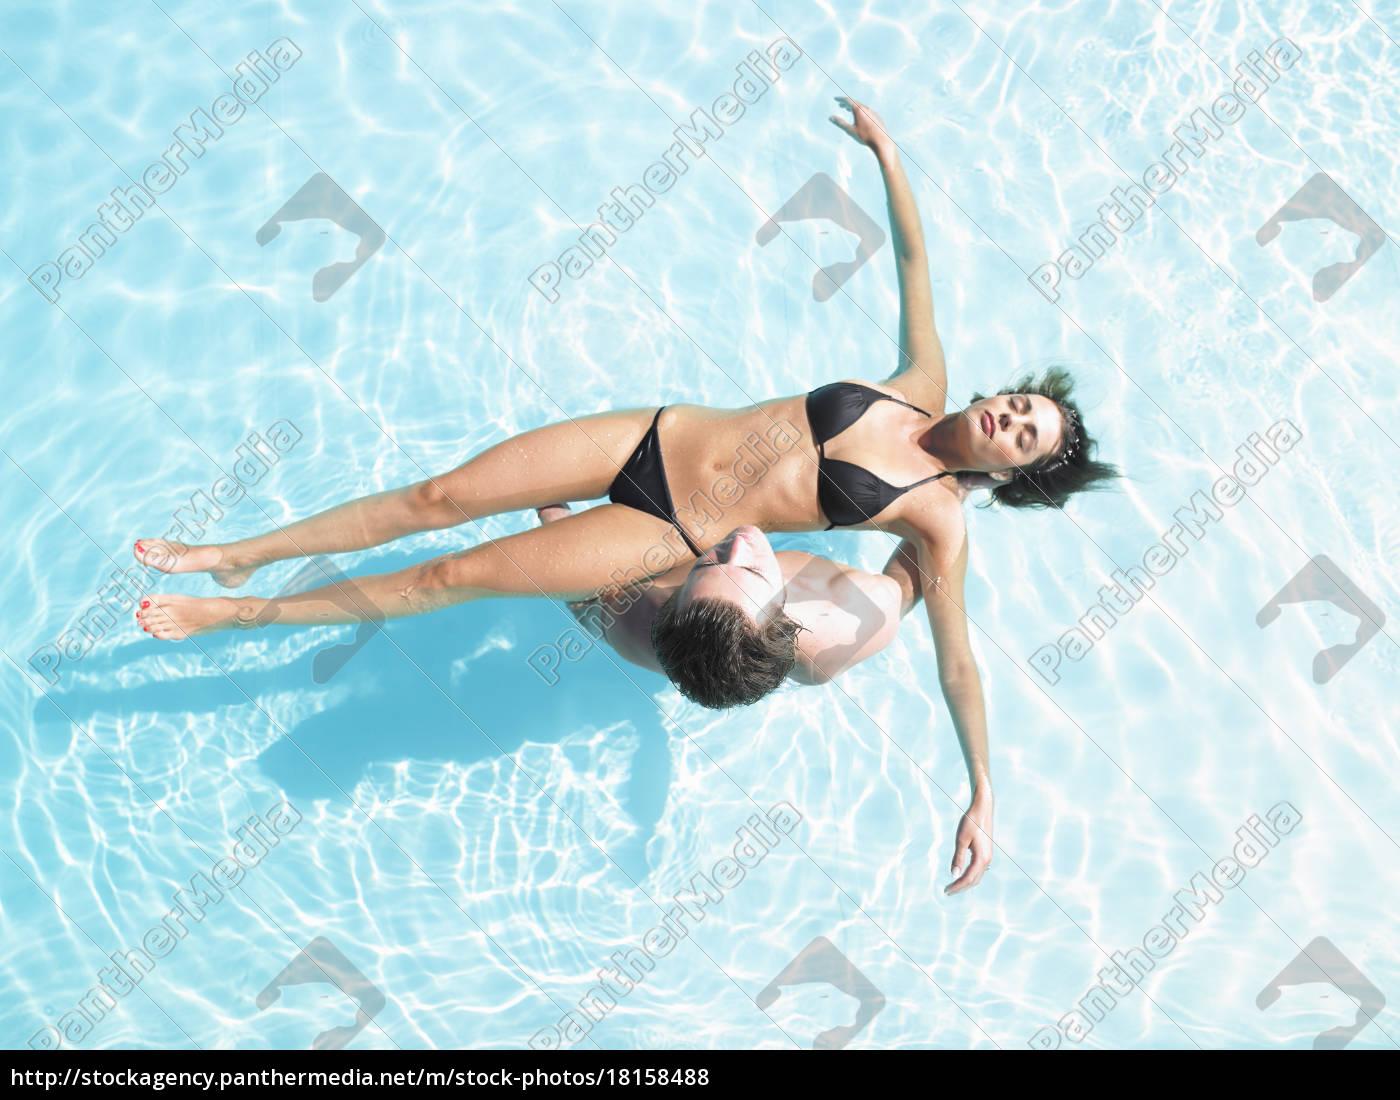 mann, hält, frau, schwimmend, im, pool - 18158488